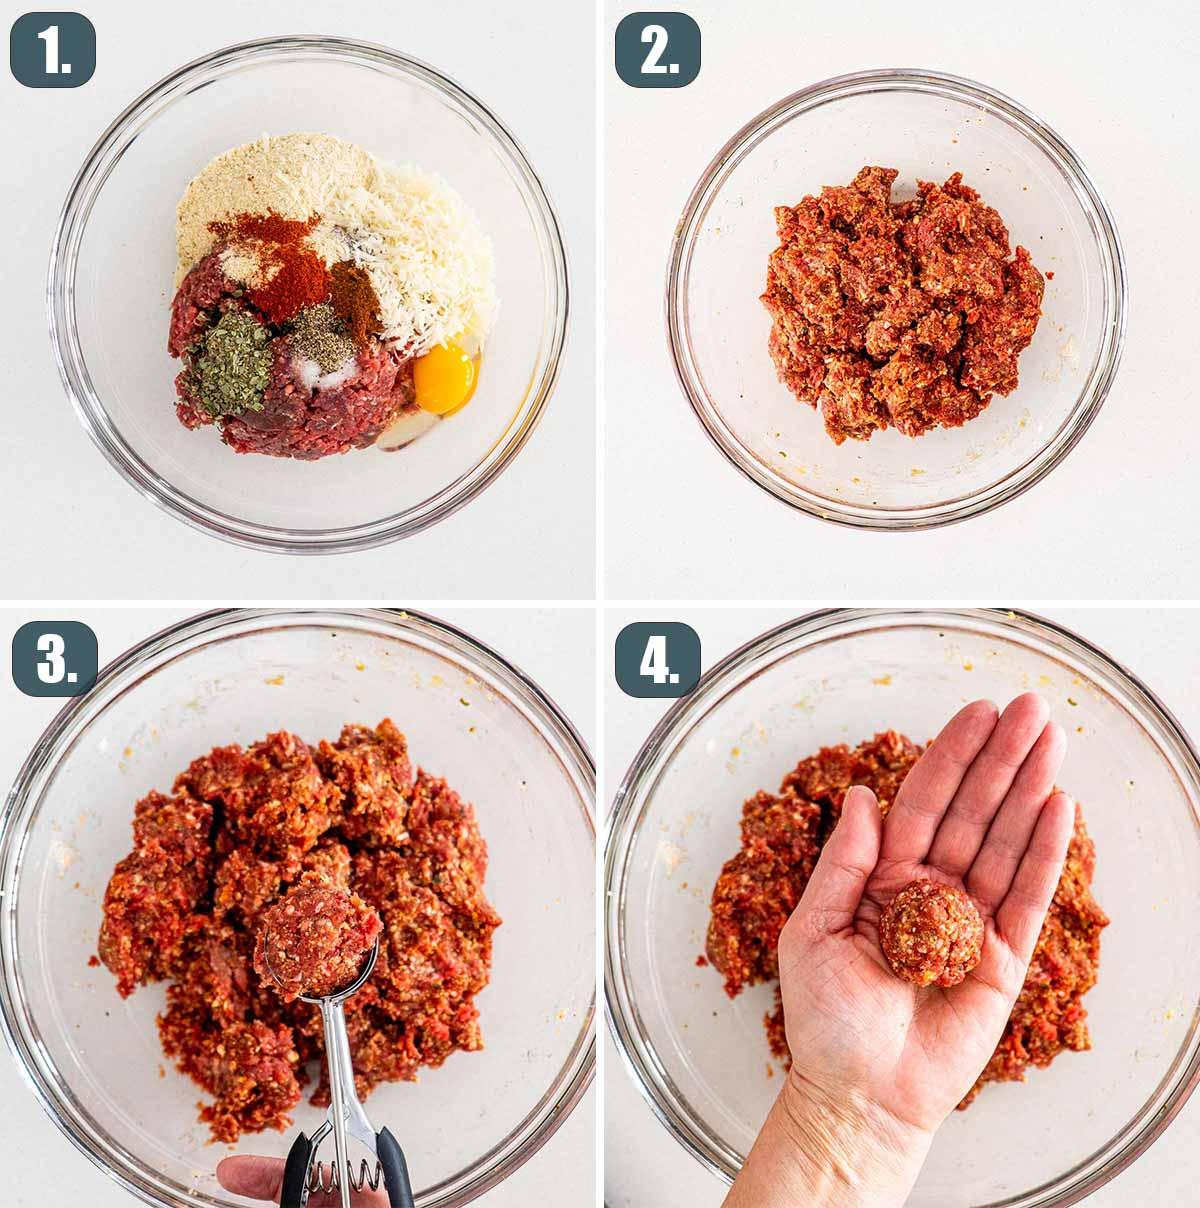 process shots showing how to make italian meatballs.